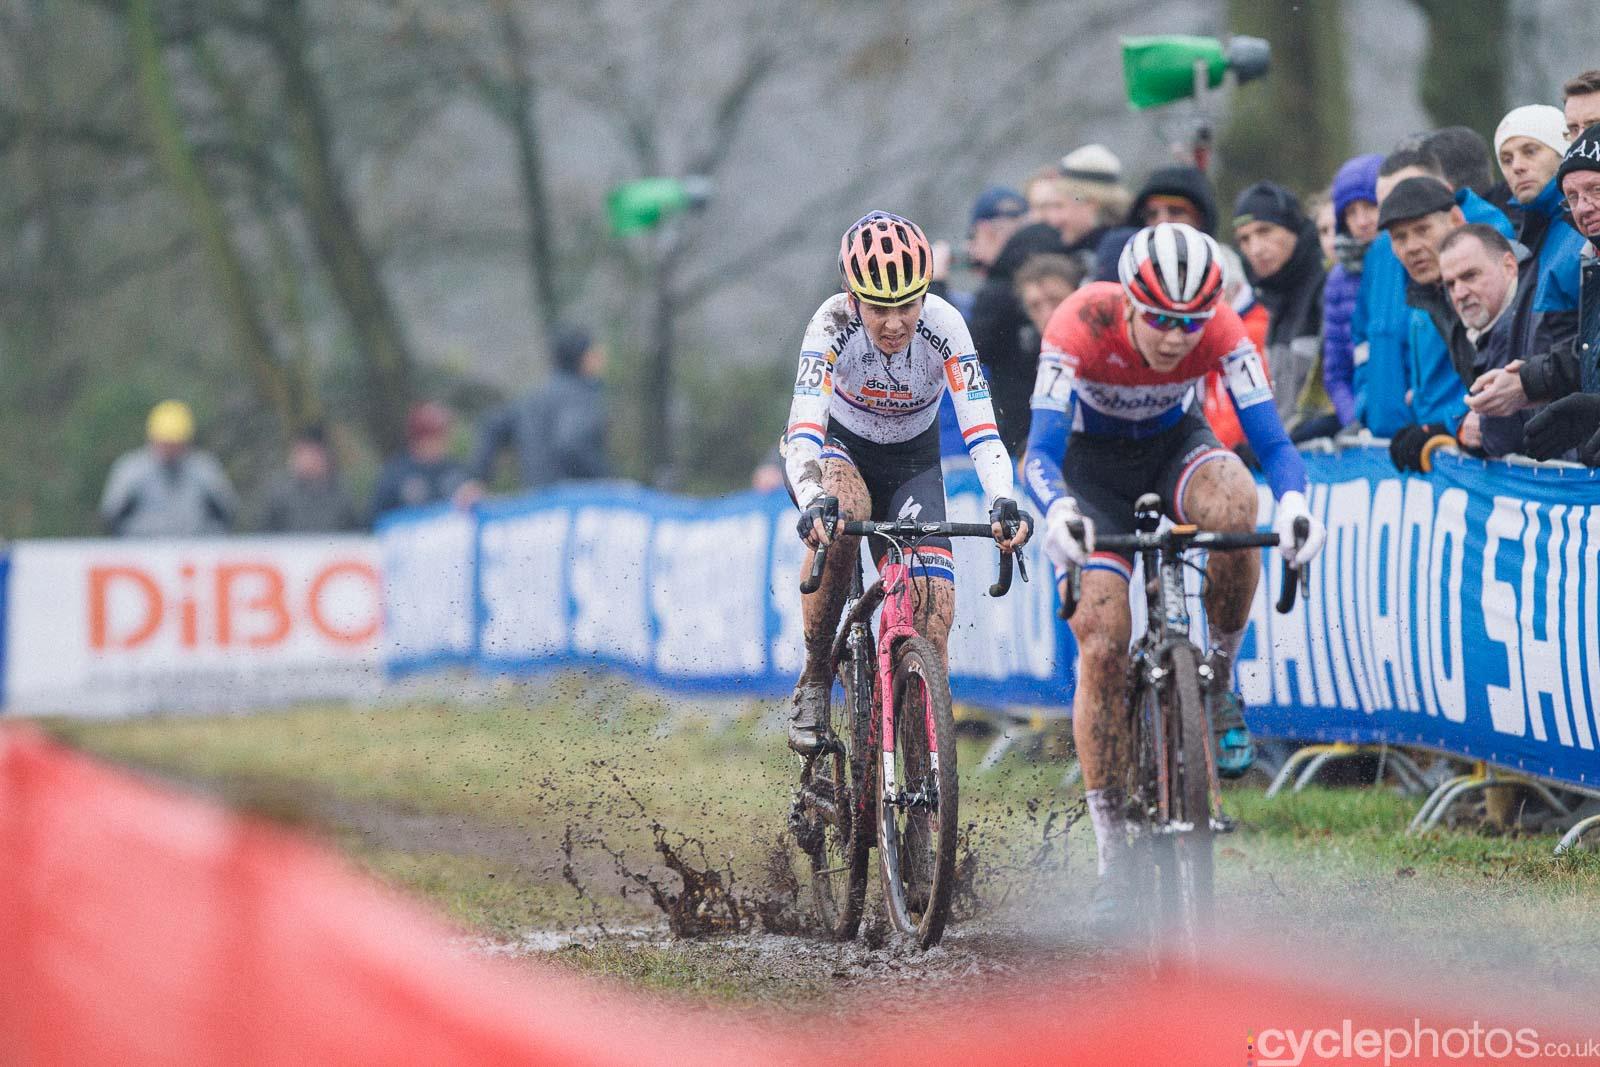 2016-cyclephotos-cyclocross-hoogerheide-140601-nikki-harris